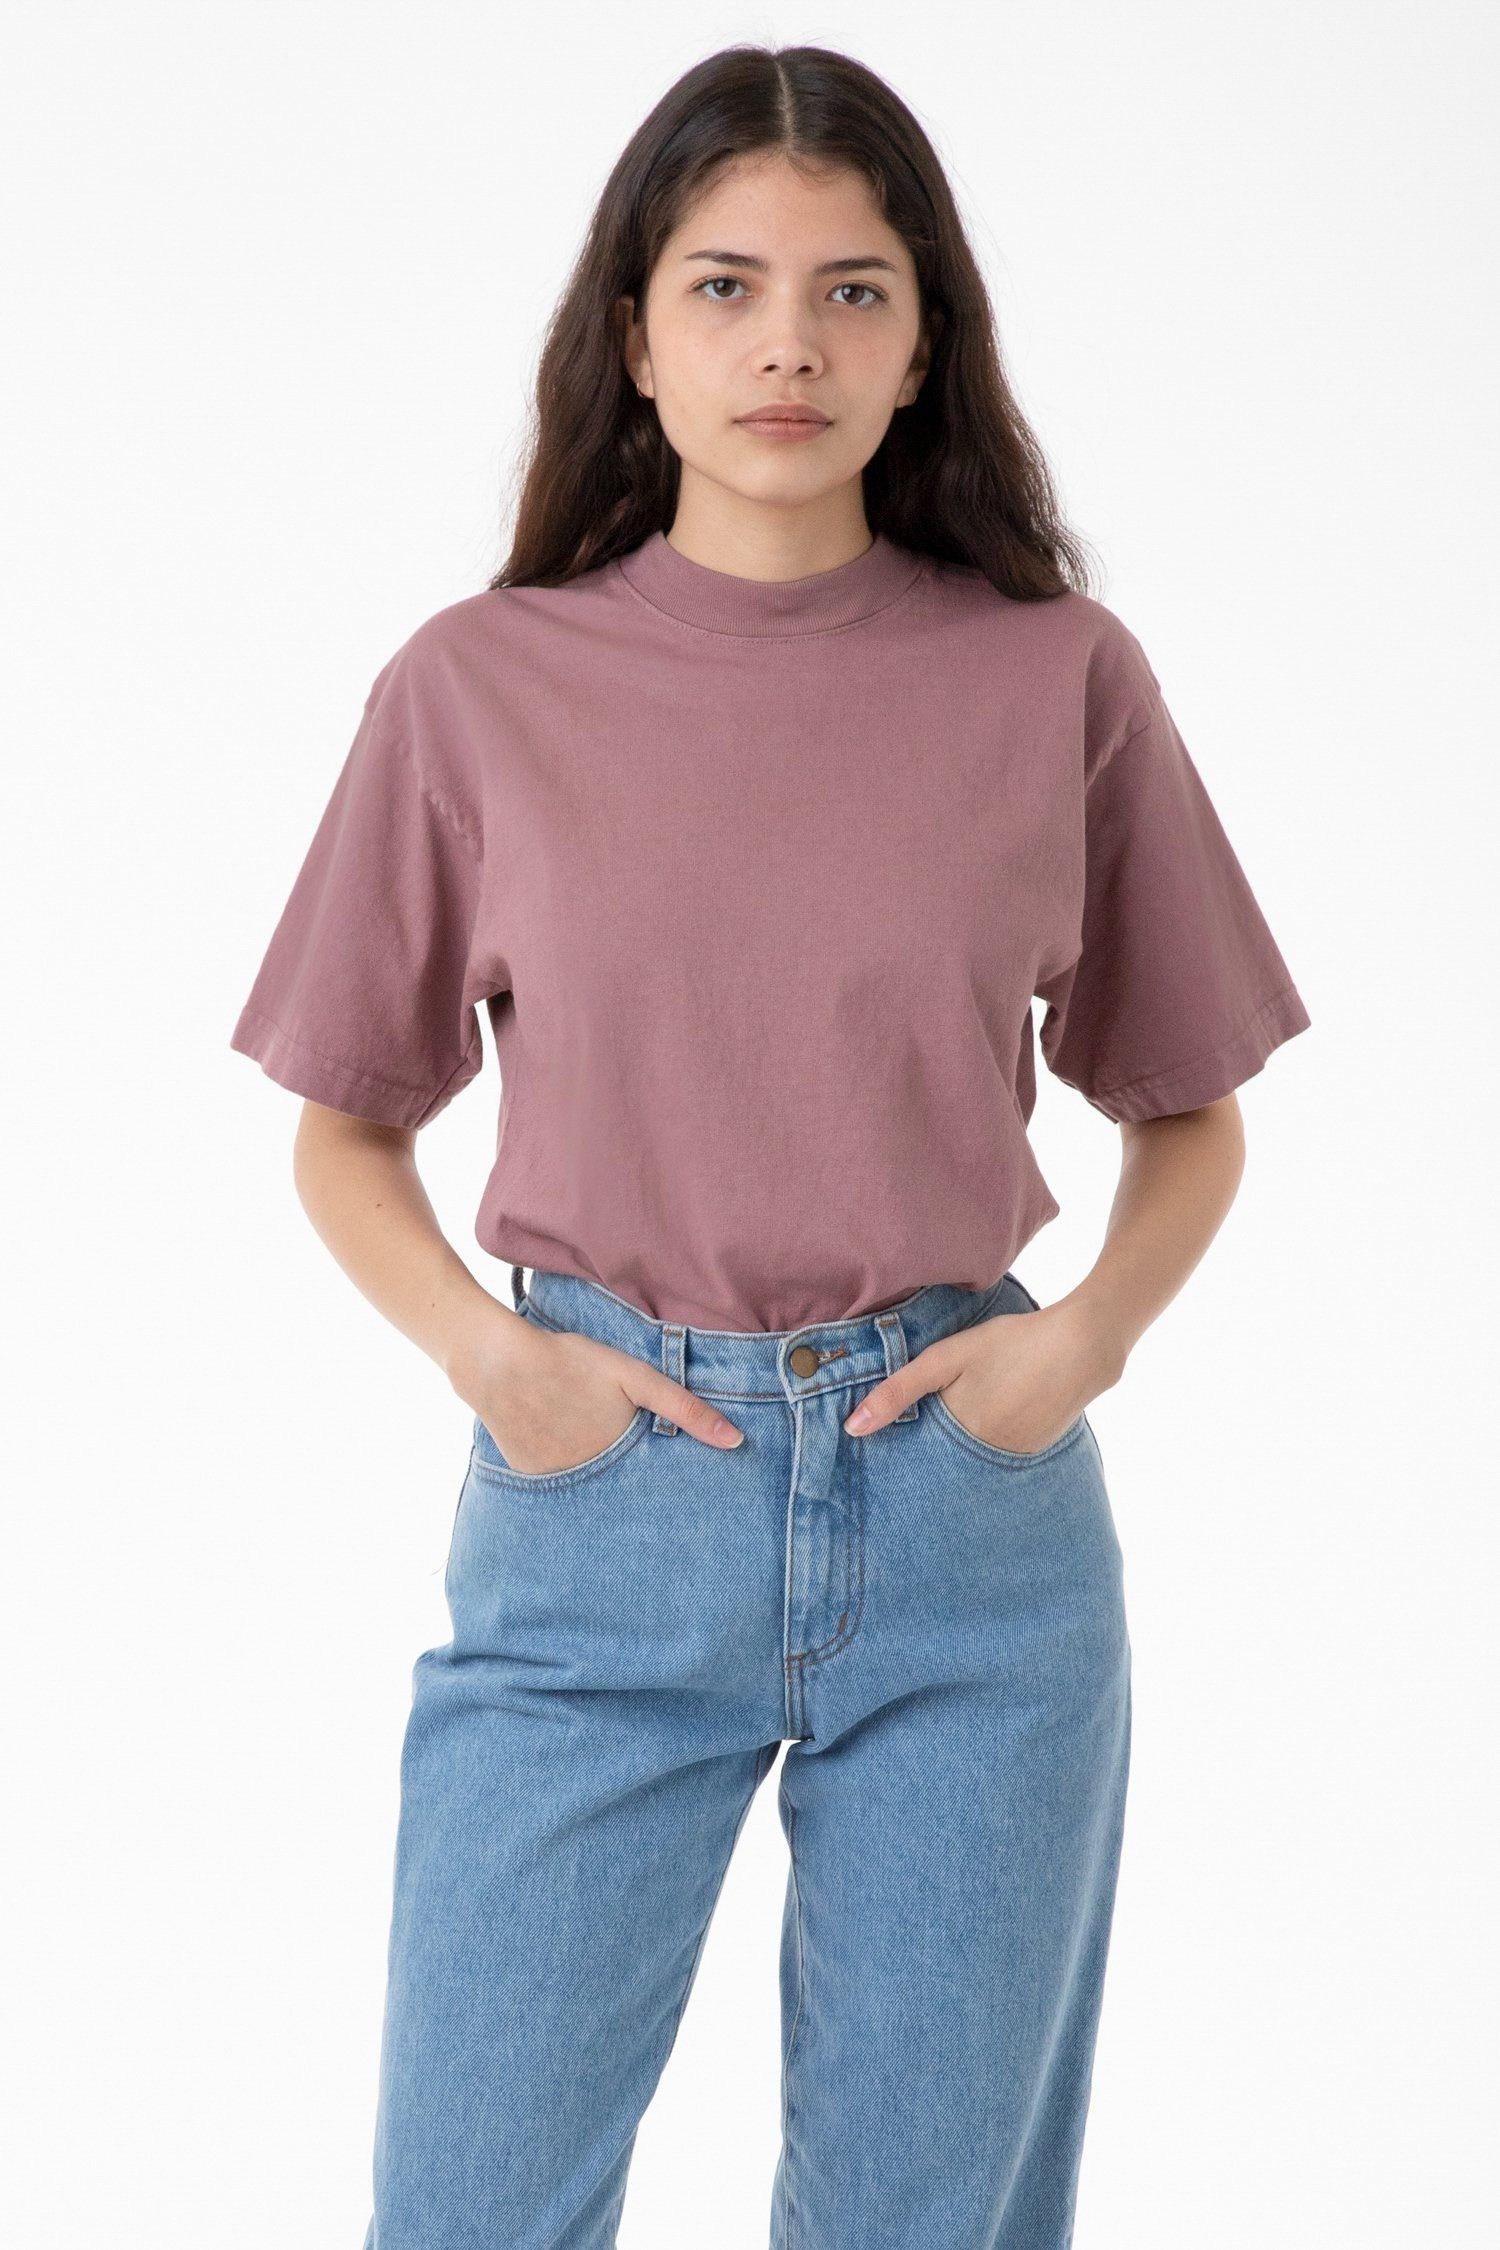 1405gd Unisex Short Sleeve Garment Dye Mockneck T Shirt Garment Dye Unisex Shorts Garment